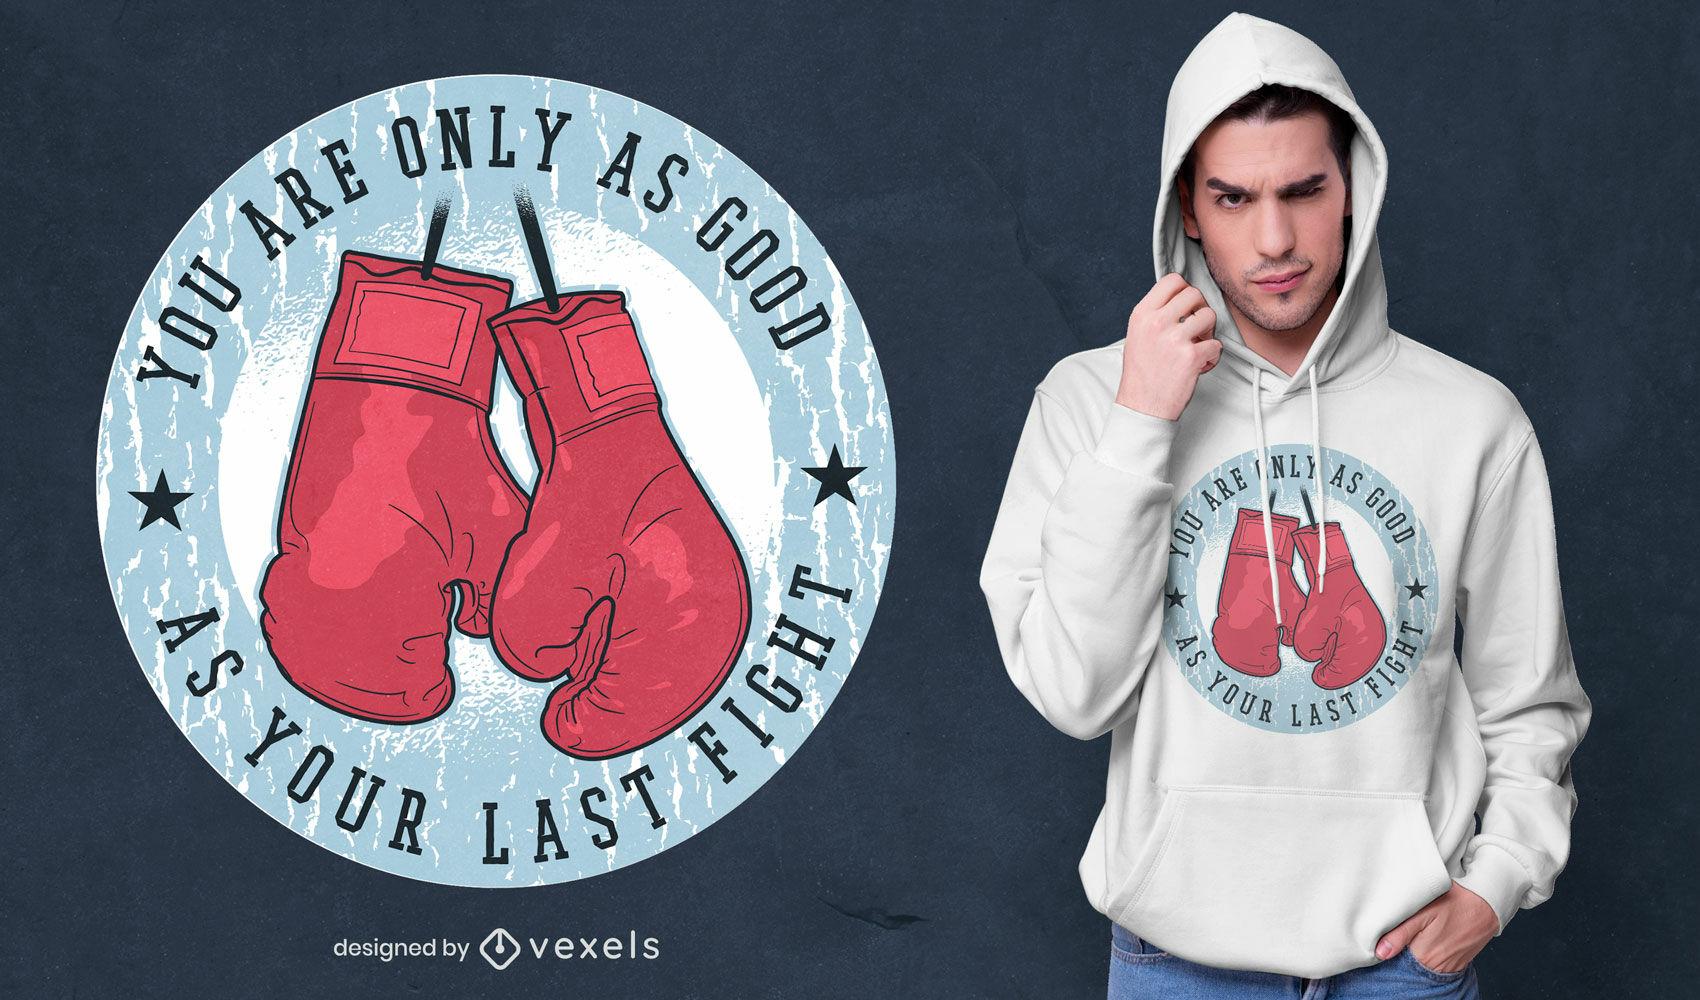 Diseño de camiseta con cita de lucha de guantes de boxeo